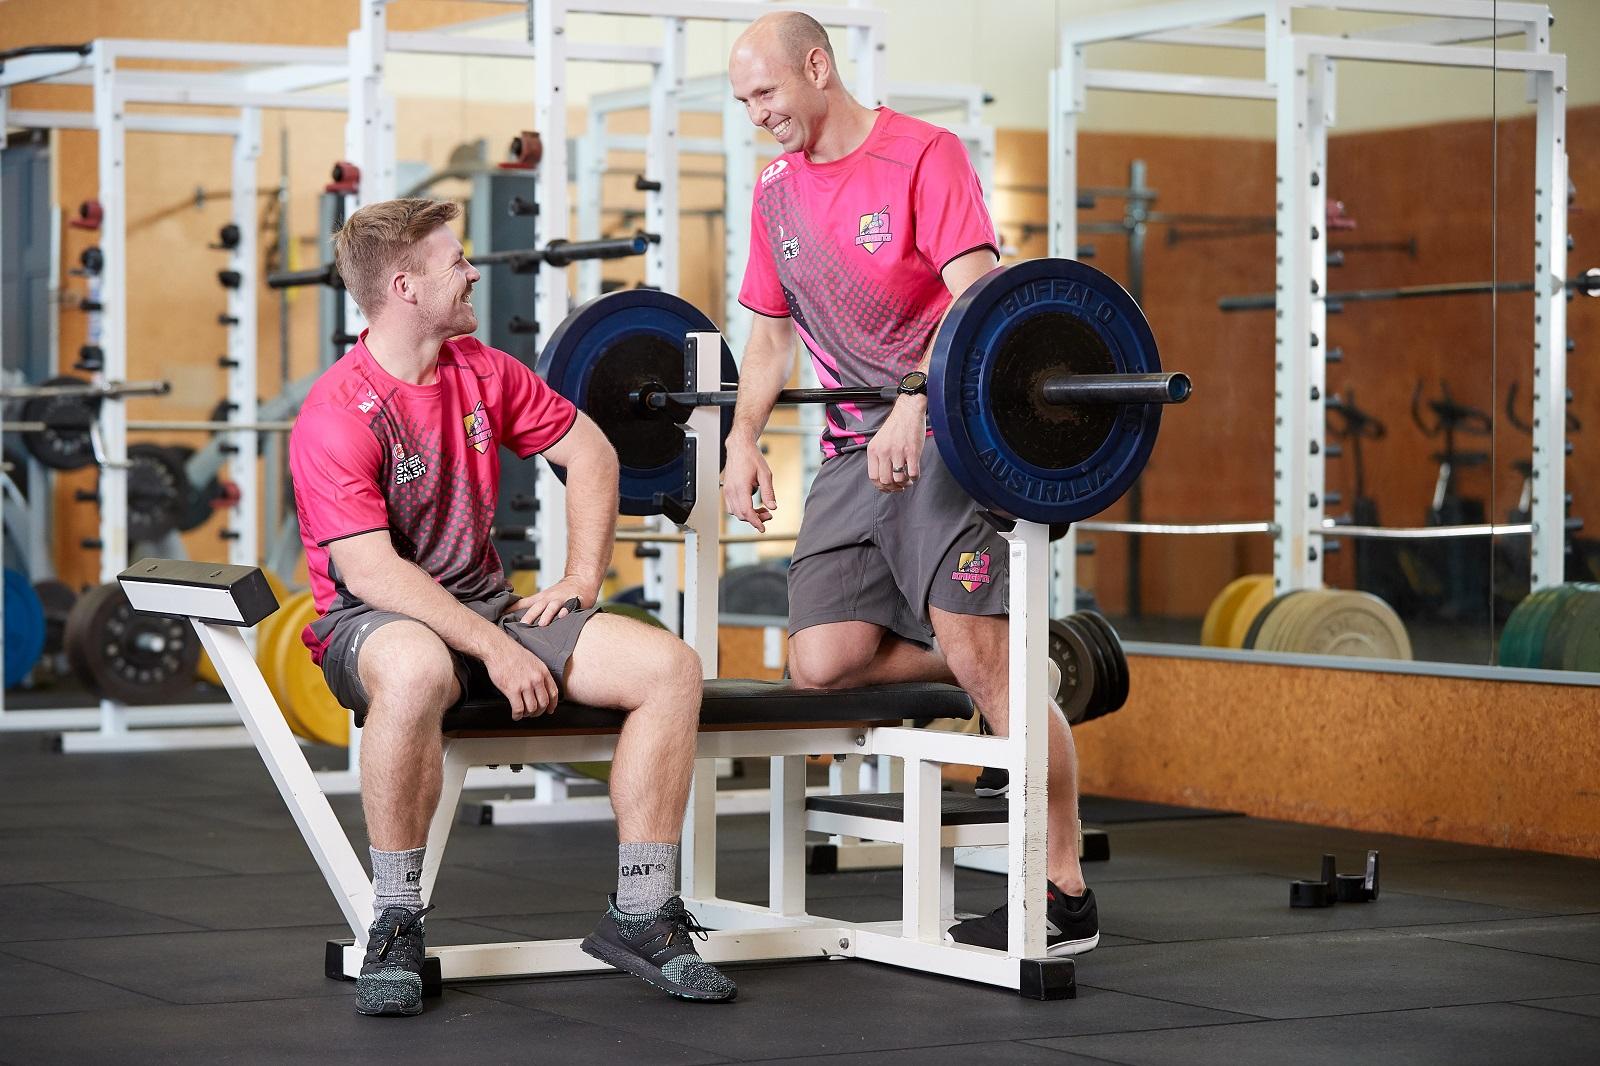 Scott Wrenn and Tim Seifert at Wintec's Gym